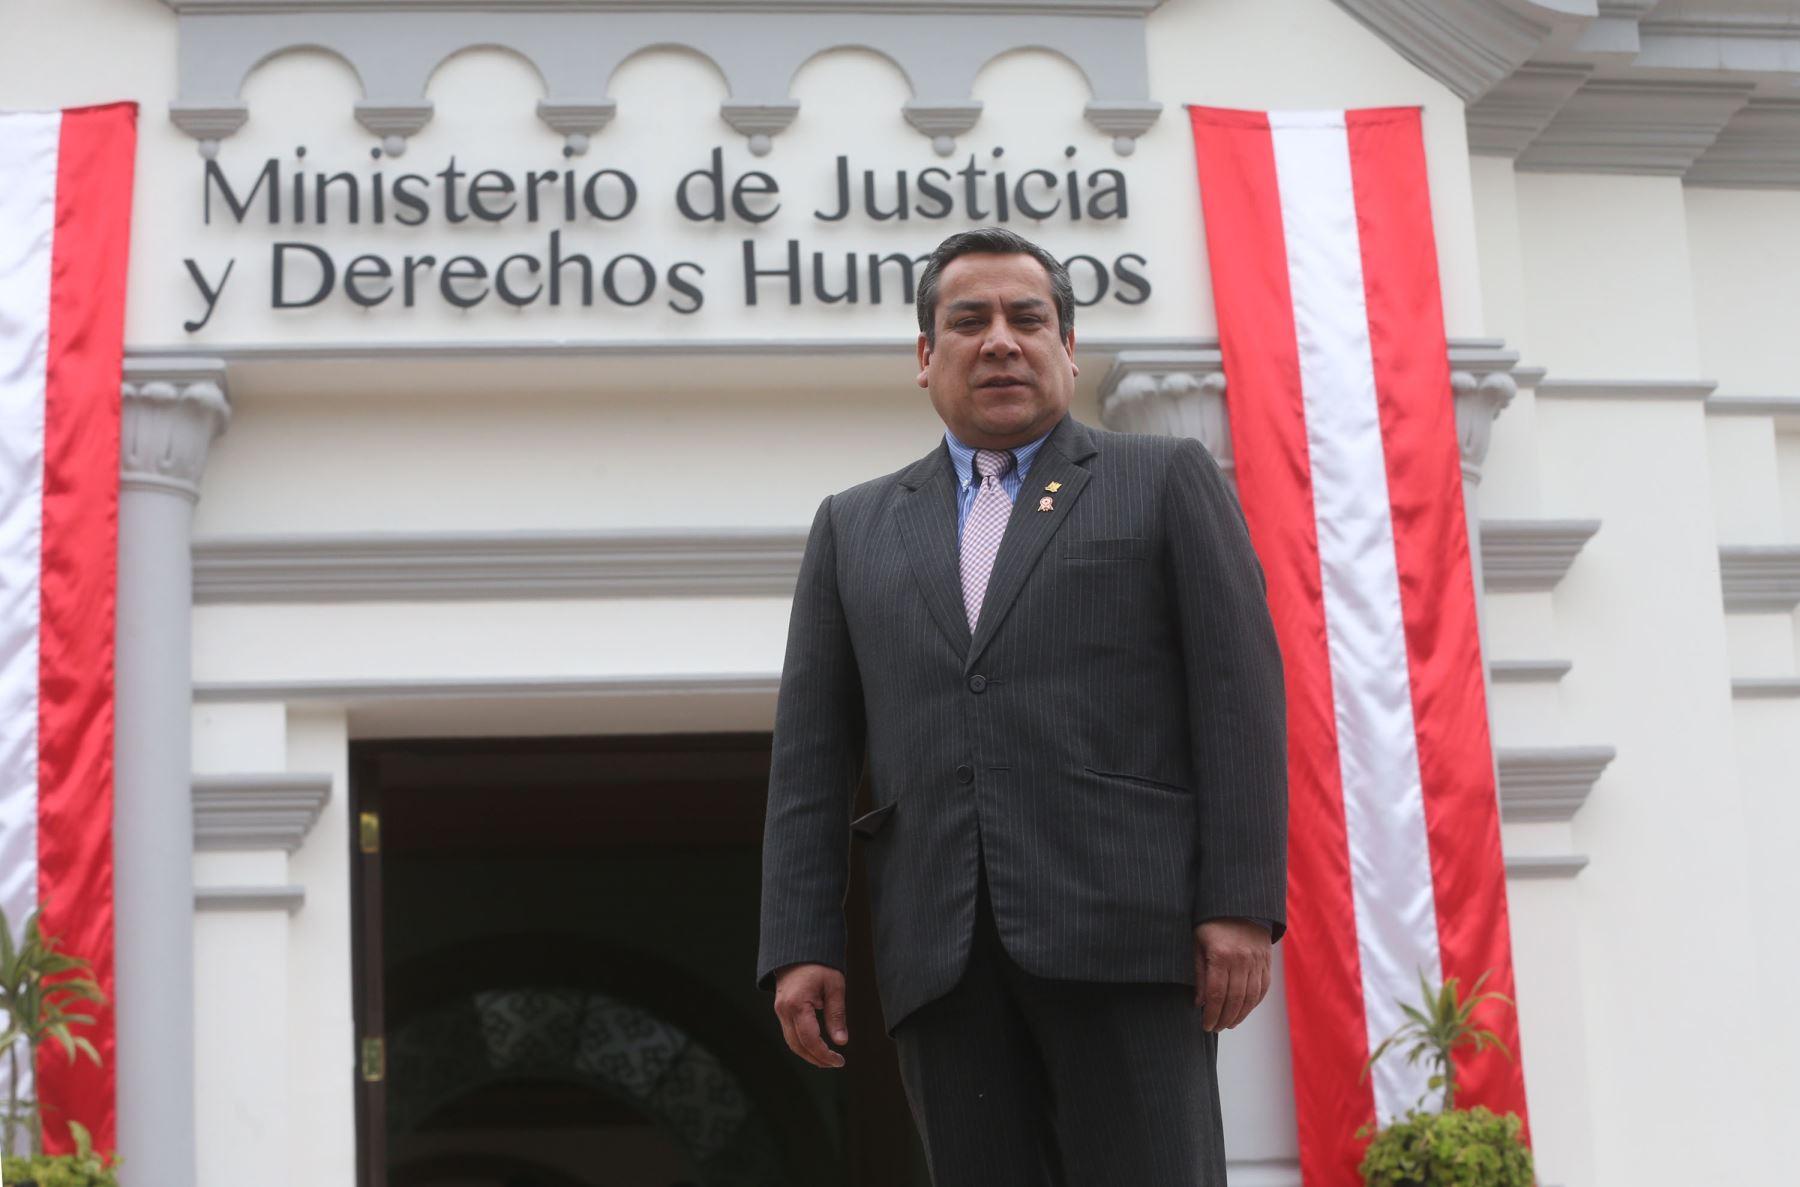 Ministro de Justicia, Gustavo Adrianzén. ANDINA/Vidal Tarqui